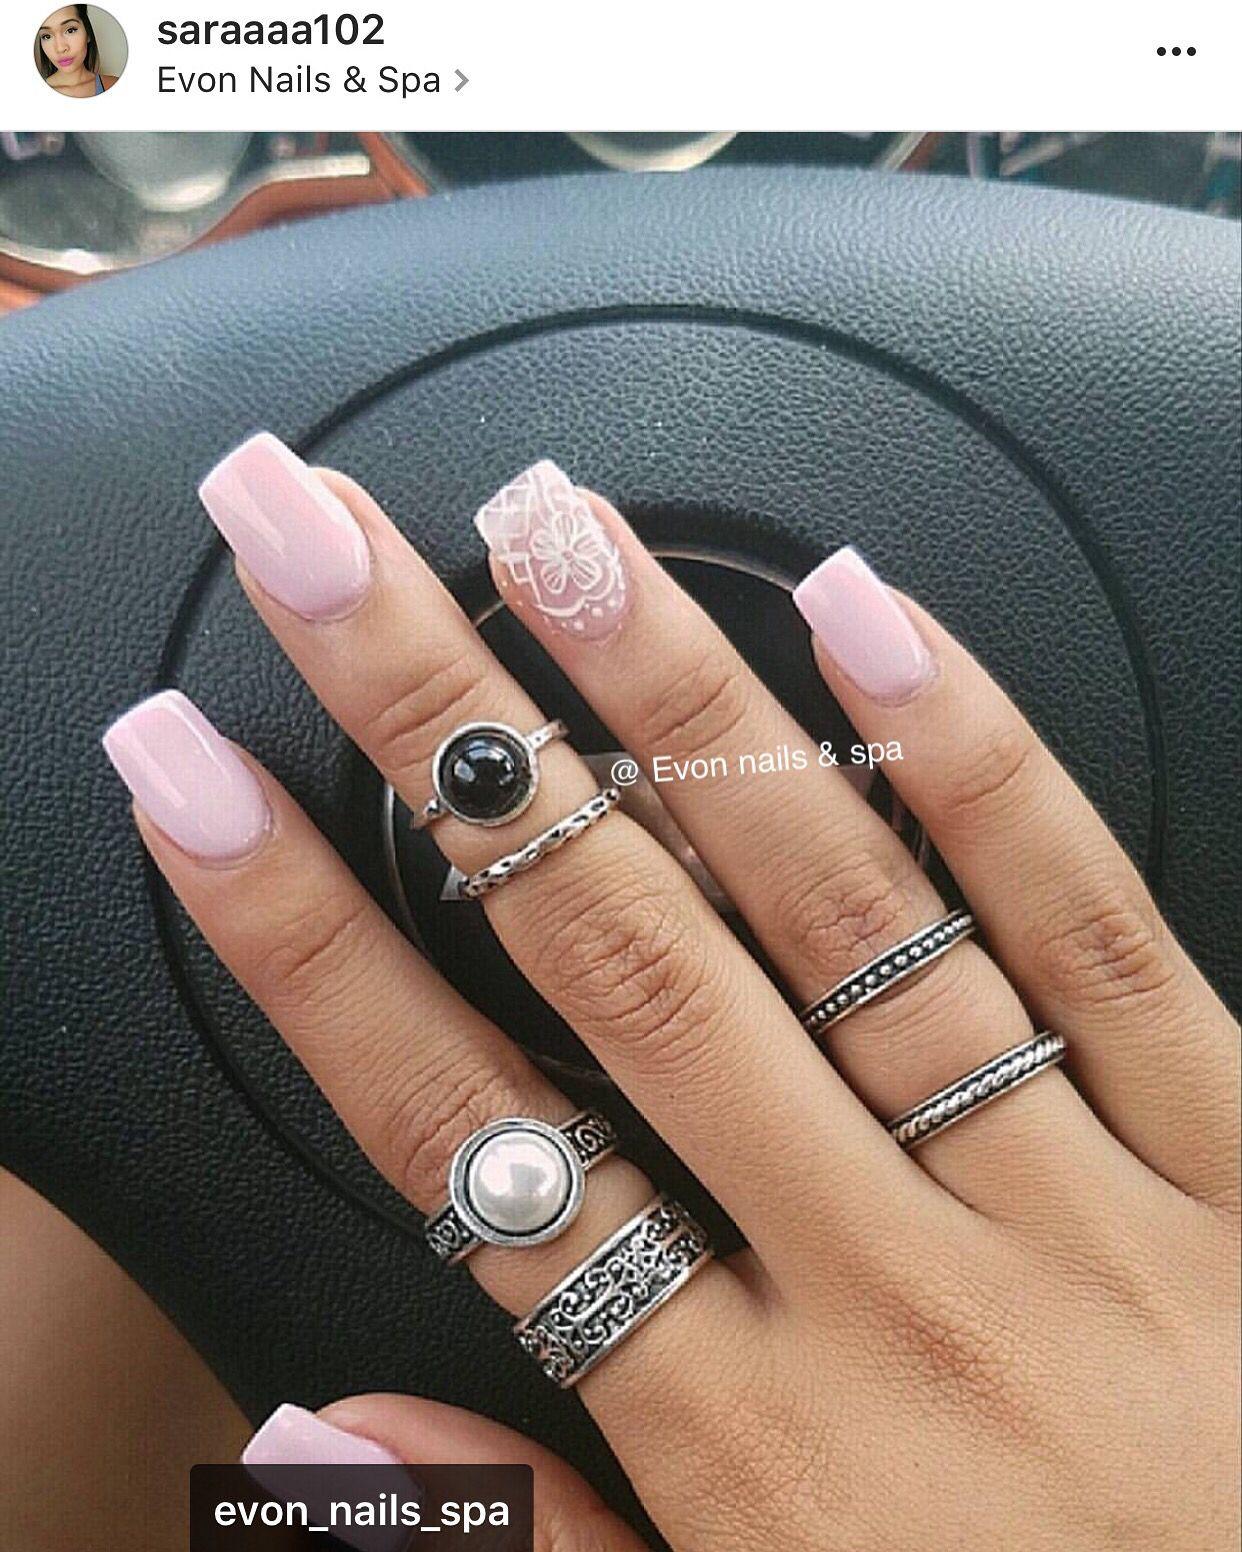 Pin by Evon Nails & Spa on Evon nails & spa | Pinterest | Nail spa